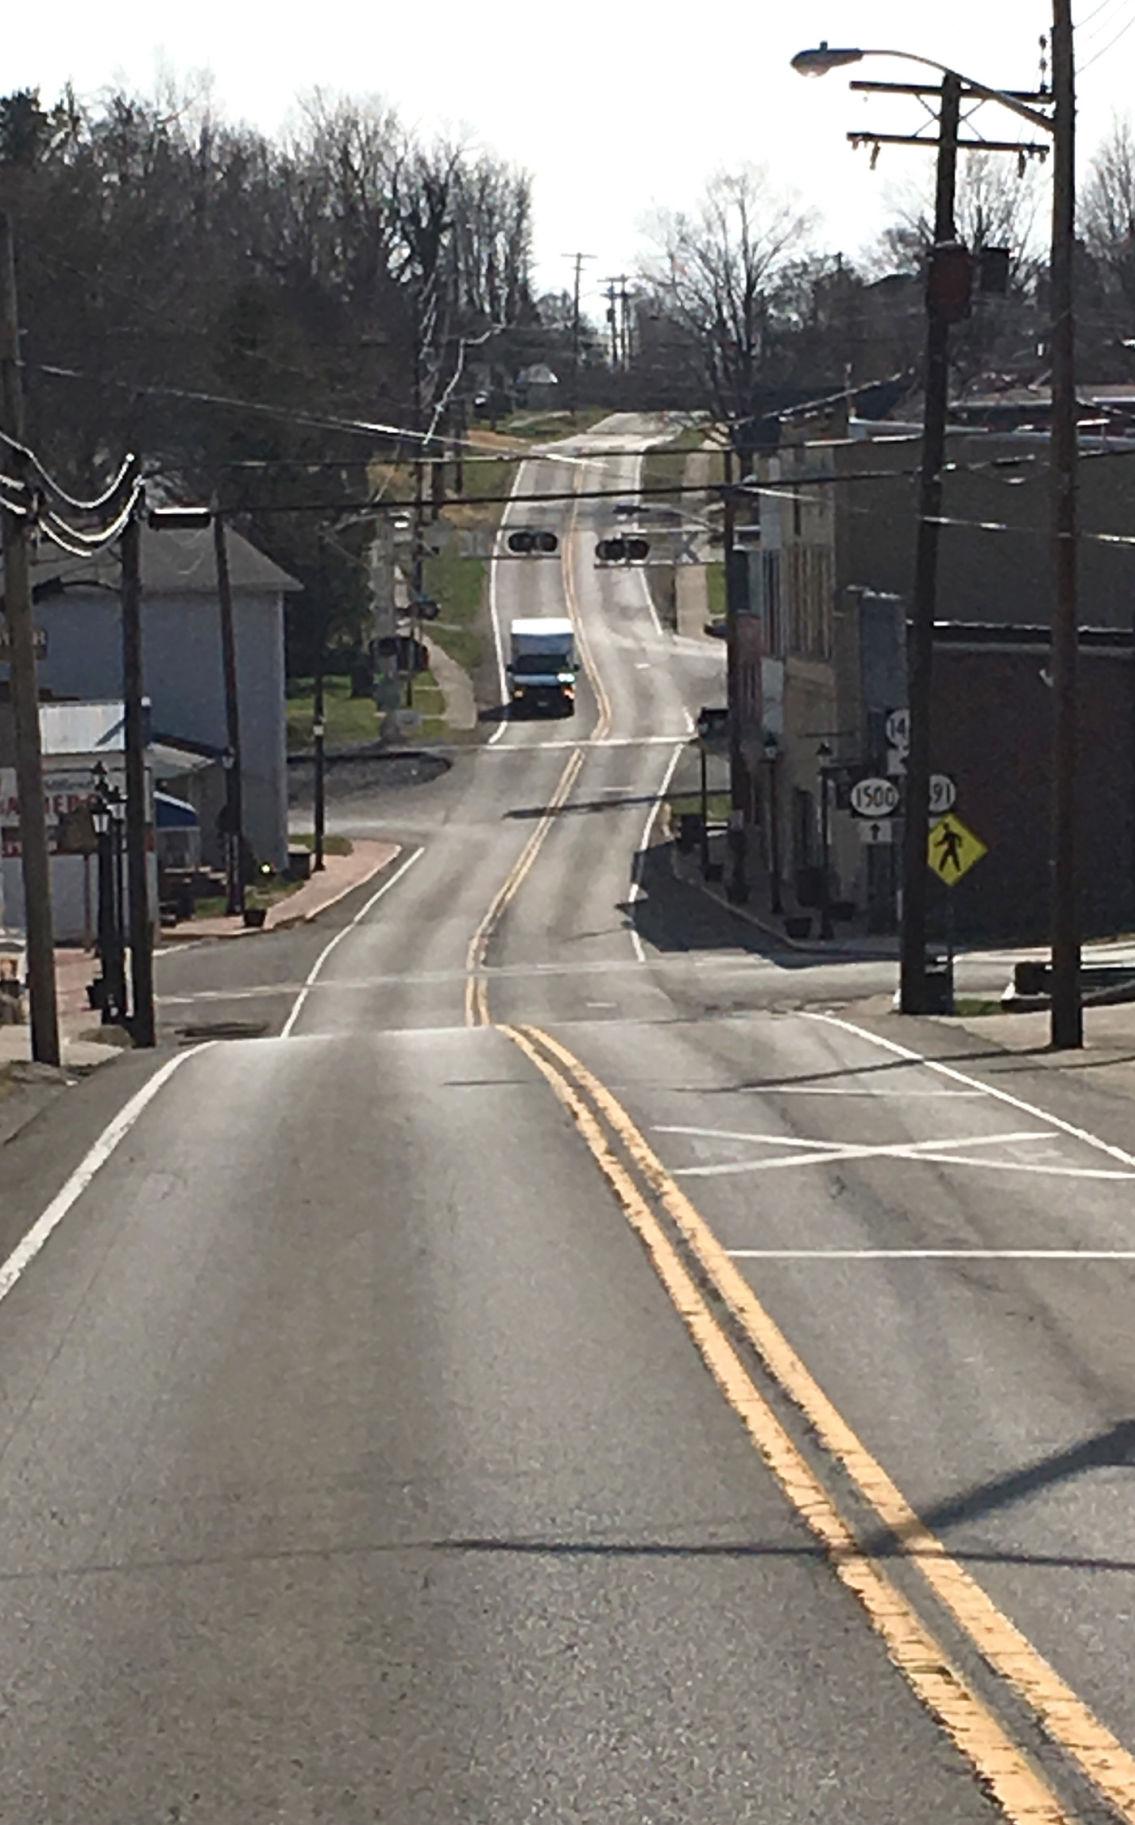 Crime-data study names Vine Grove safest city in state